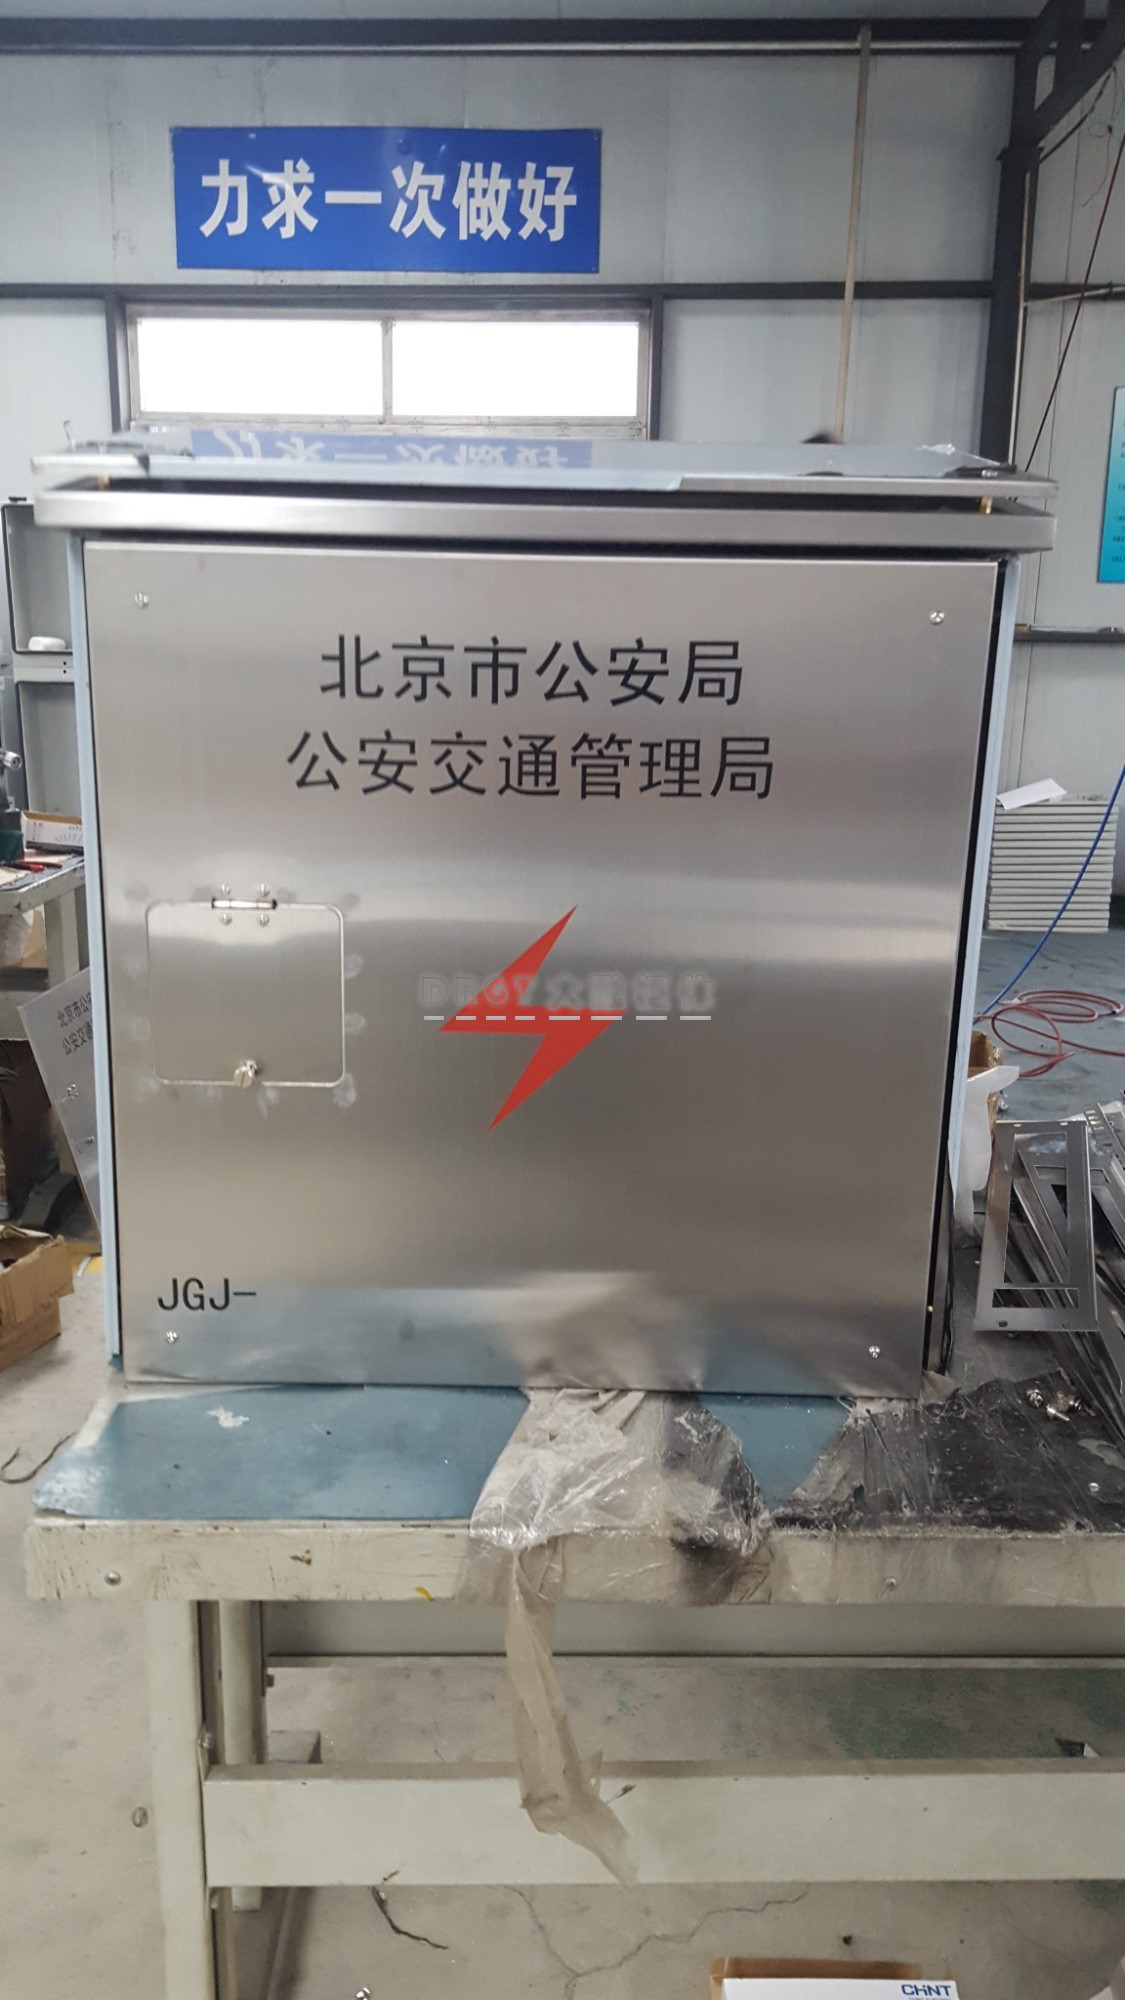 DRGT-户外交通管理箱